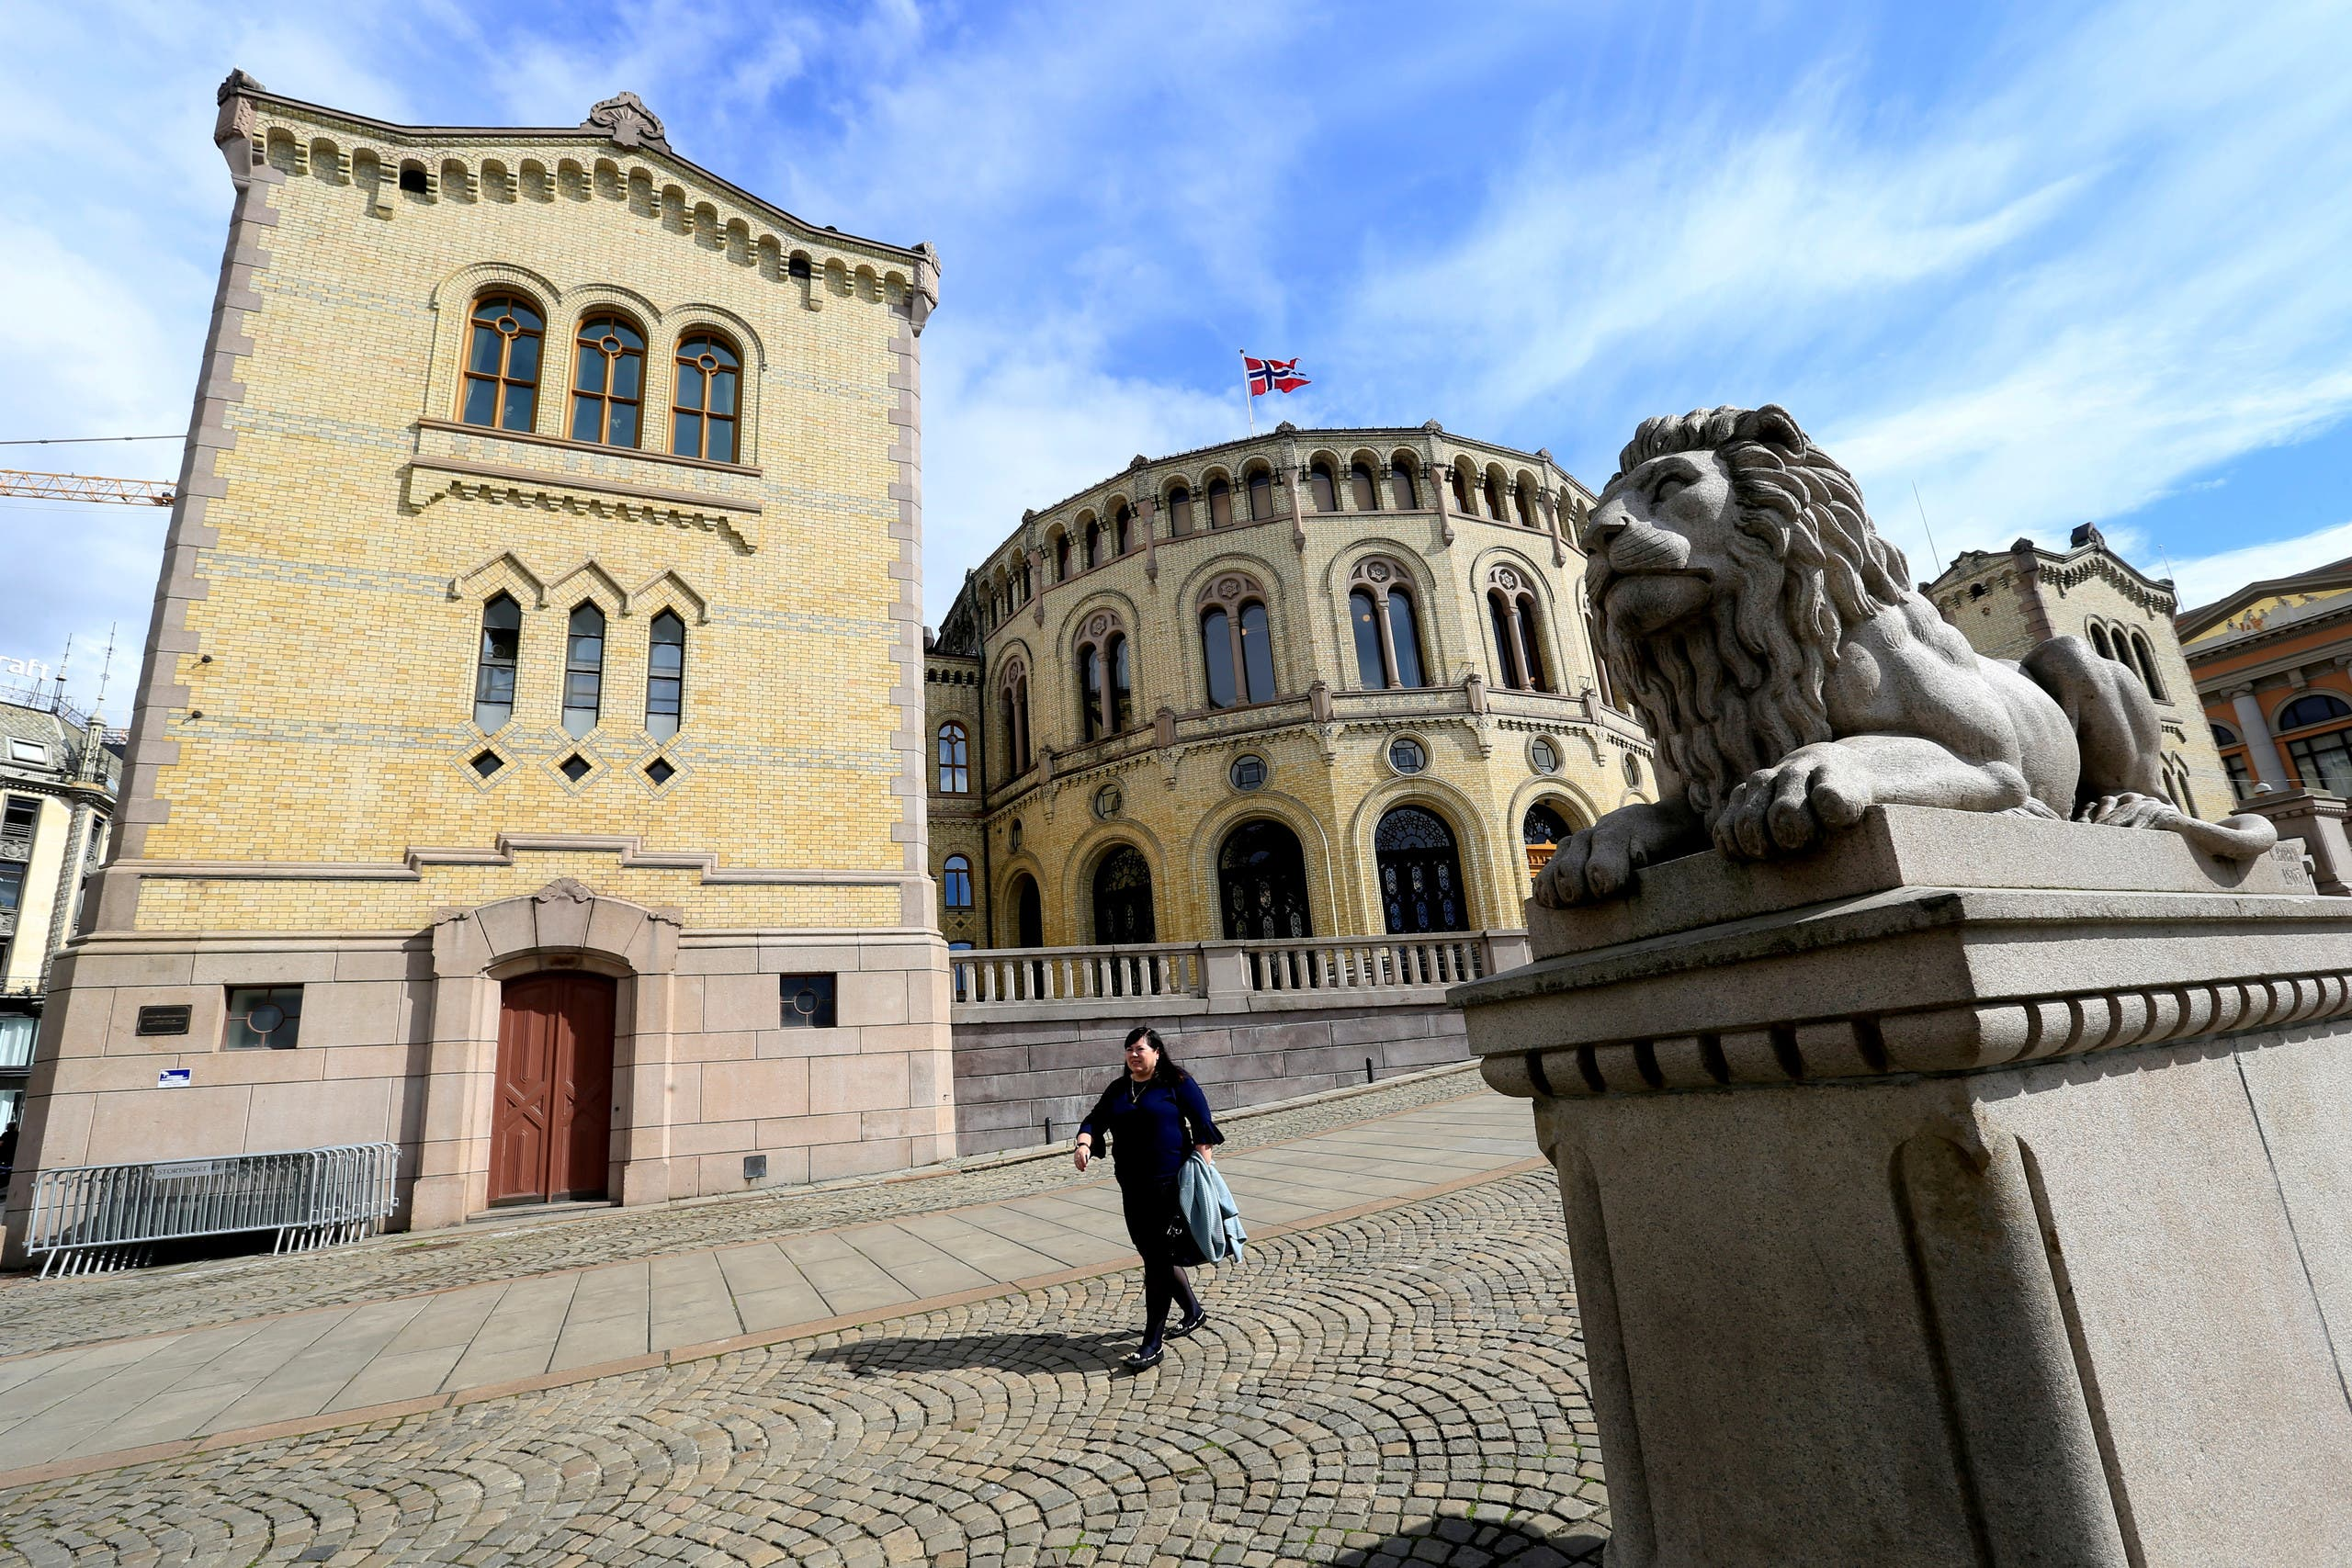 Norwegian Parliament house is seen in Oslo, Norway. (Reuters)